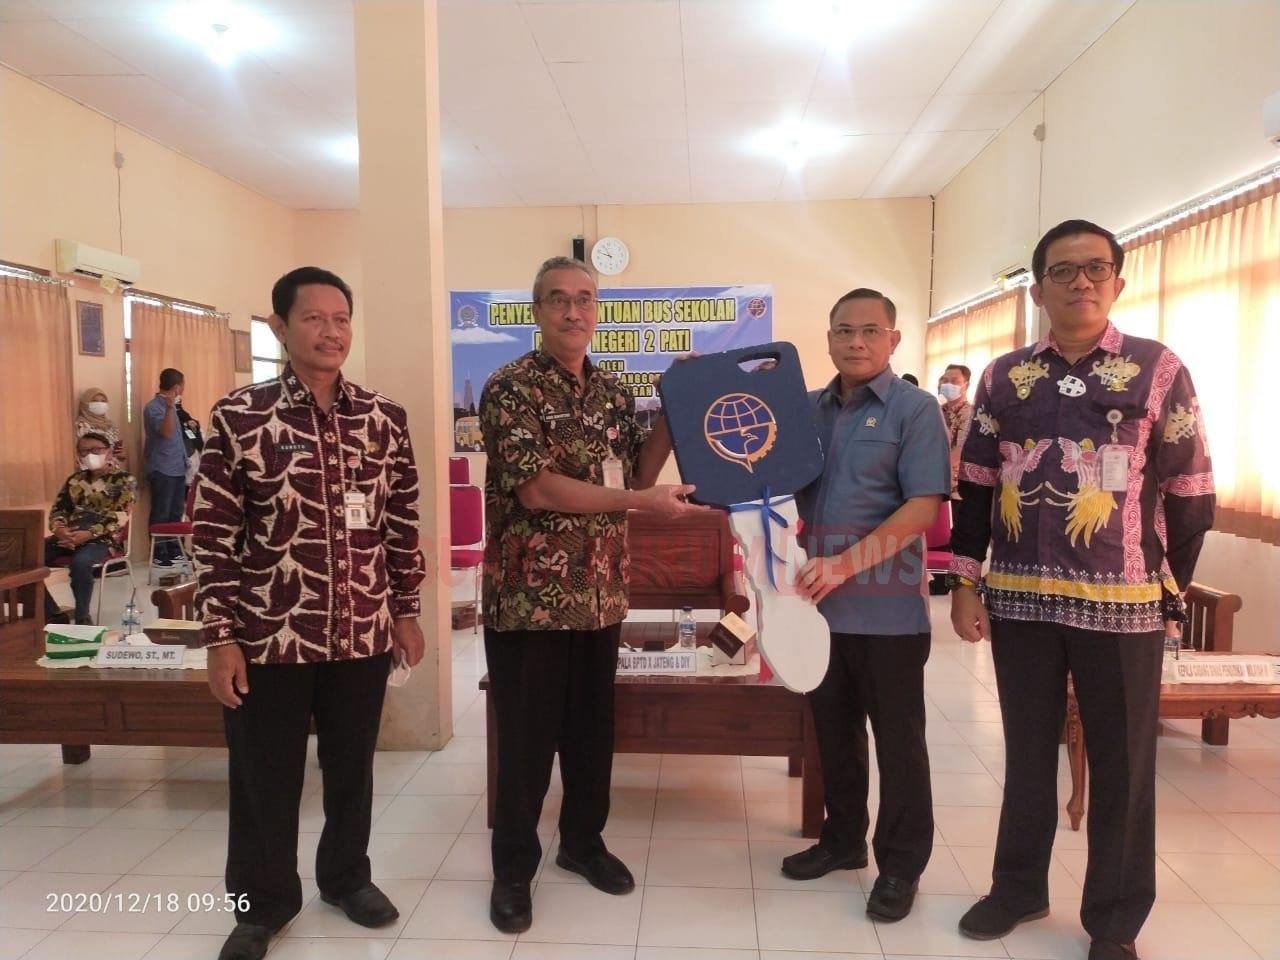 Sebagai Alumni SMA Negeri 01 Pati Th.1988, H.Sudewo ,Membanggakan Almamater Tercinta